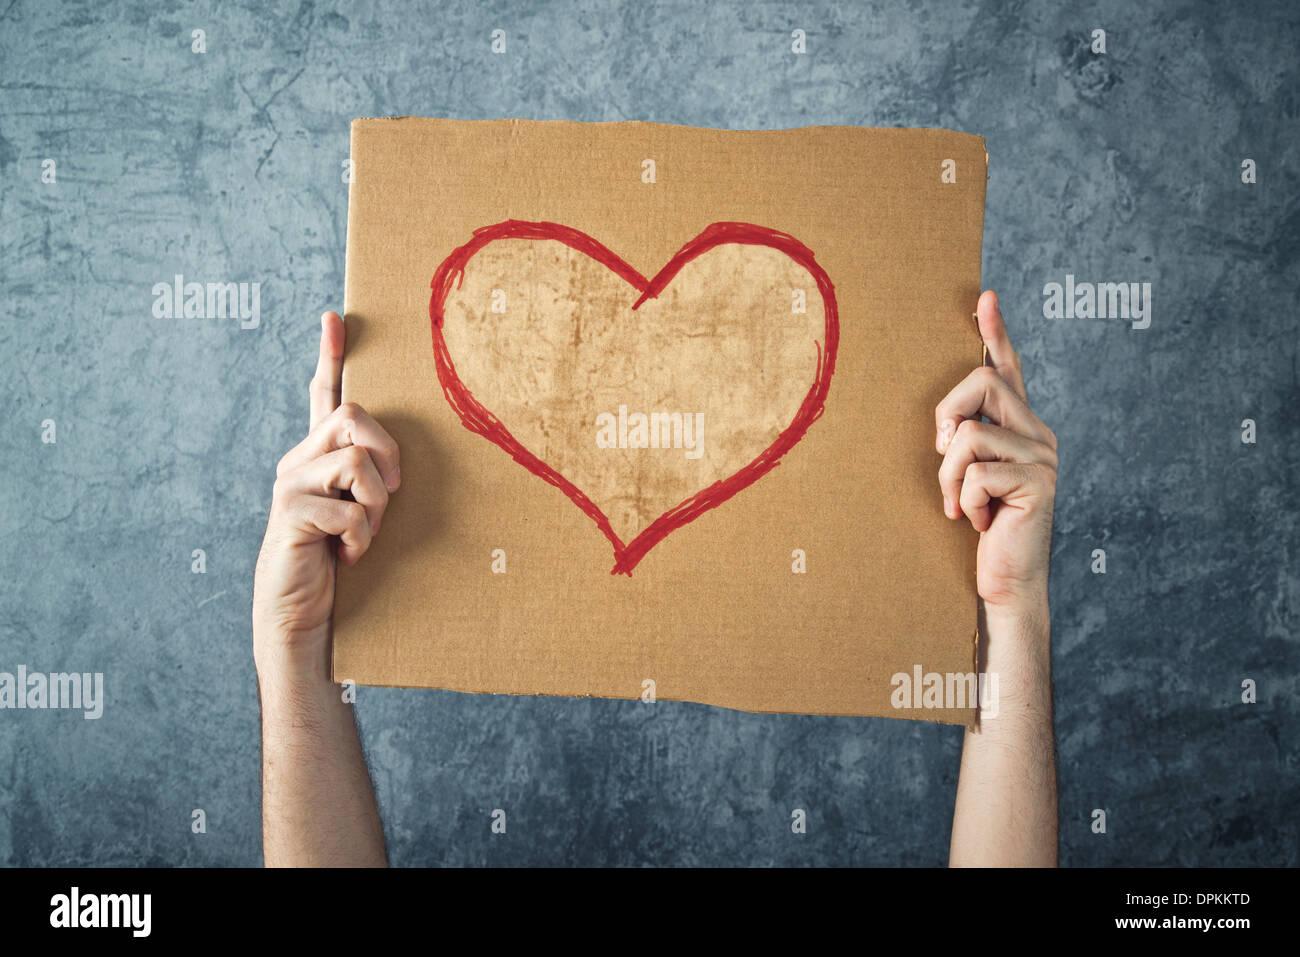 Hombre sujetando un cartón de papel con forma de corazón de San Valentín dibujo como imagen conceptual. Imagen De Stock